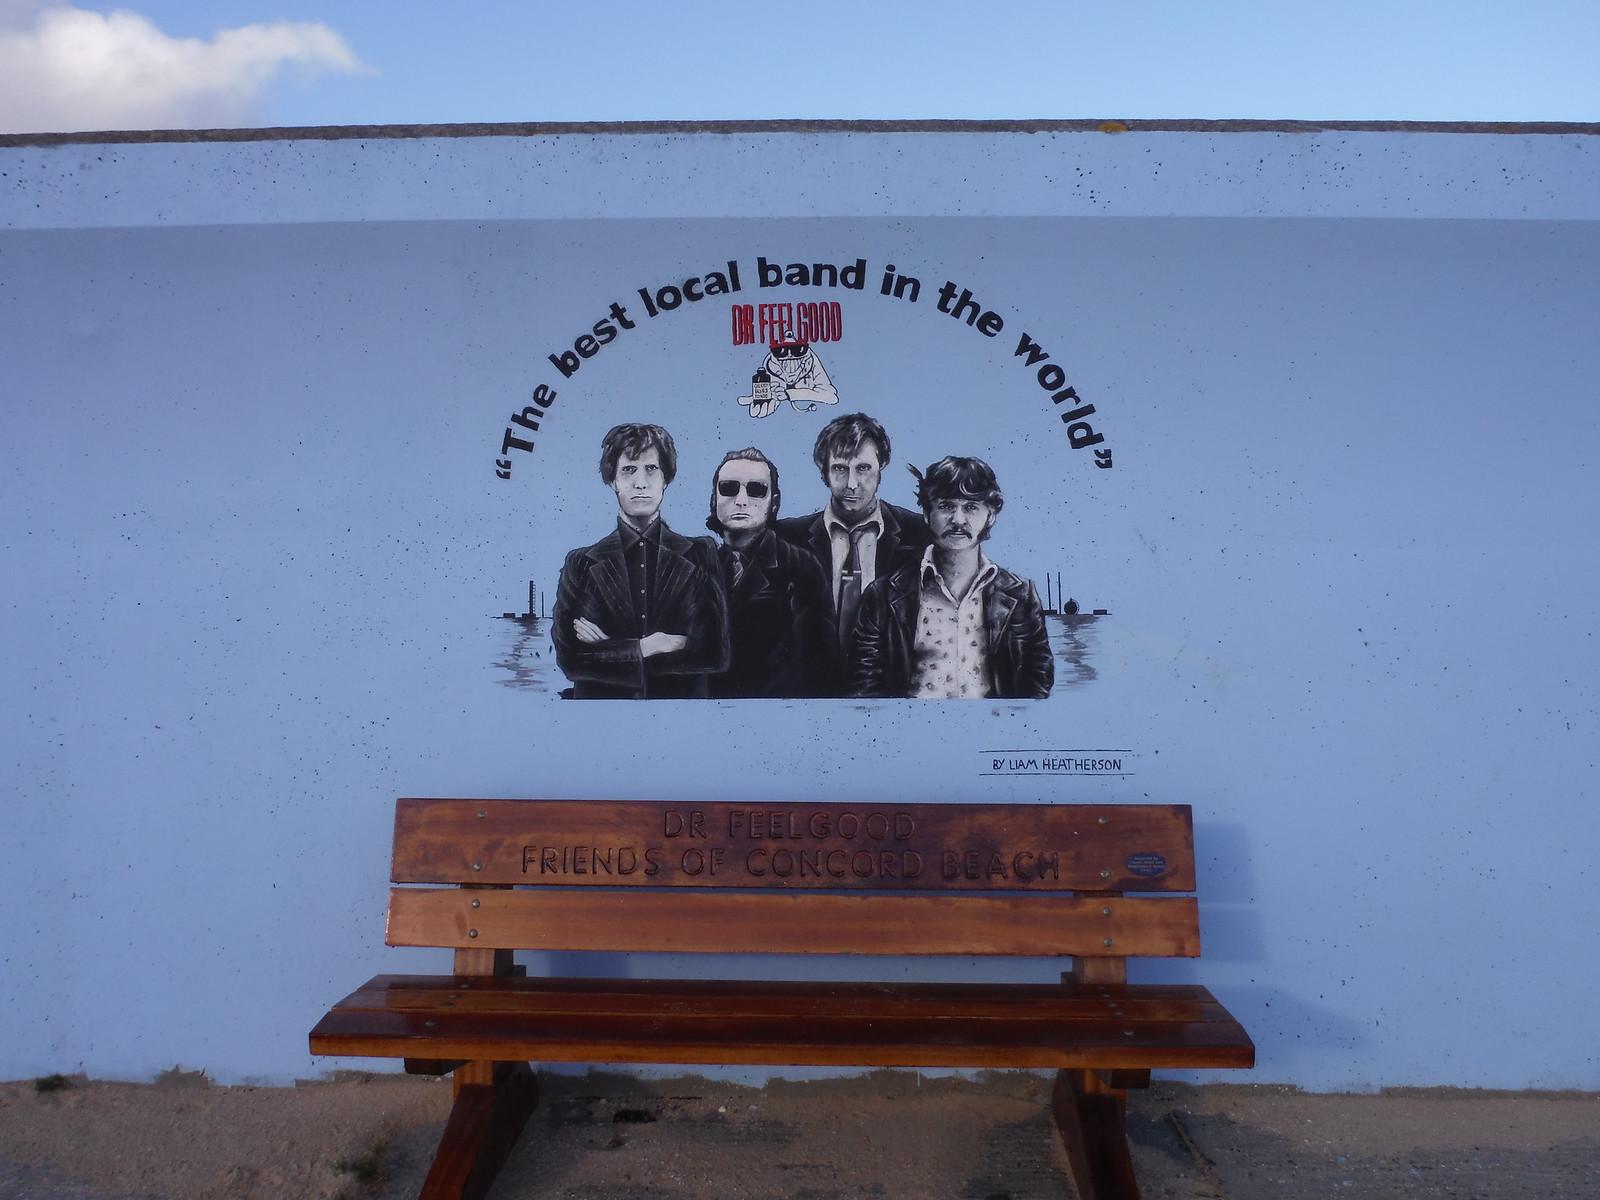 Dr. Feelgood bench and mural, Concord Beach, Canvey Island SWC Walk 258 Benfleet Circular (via Canvey Island)